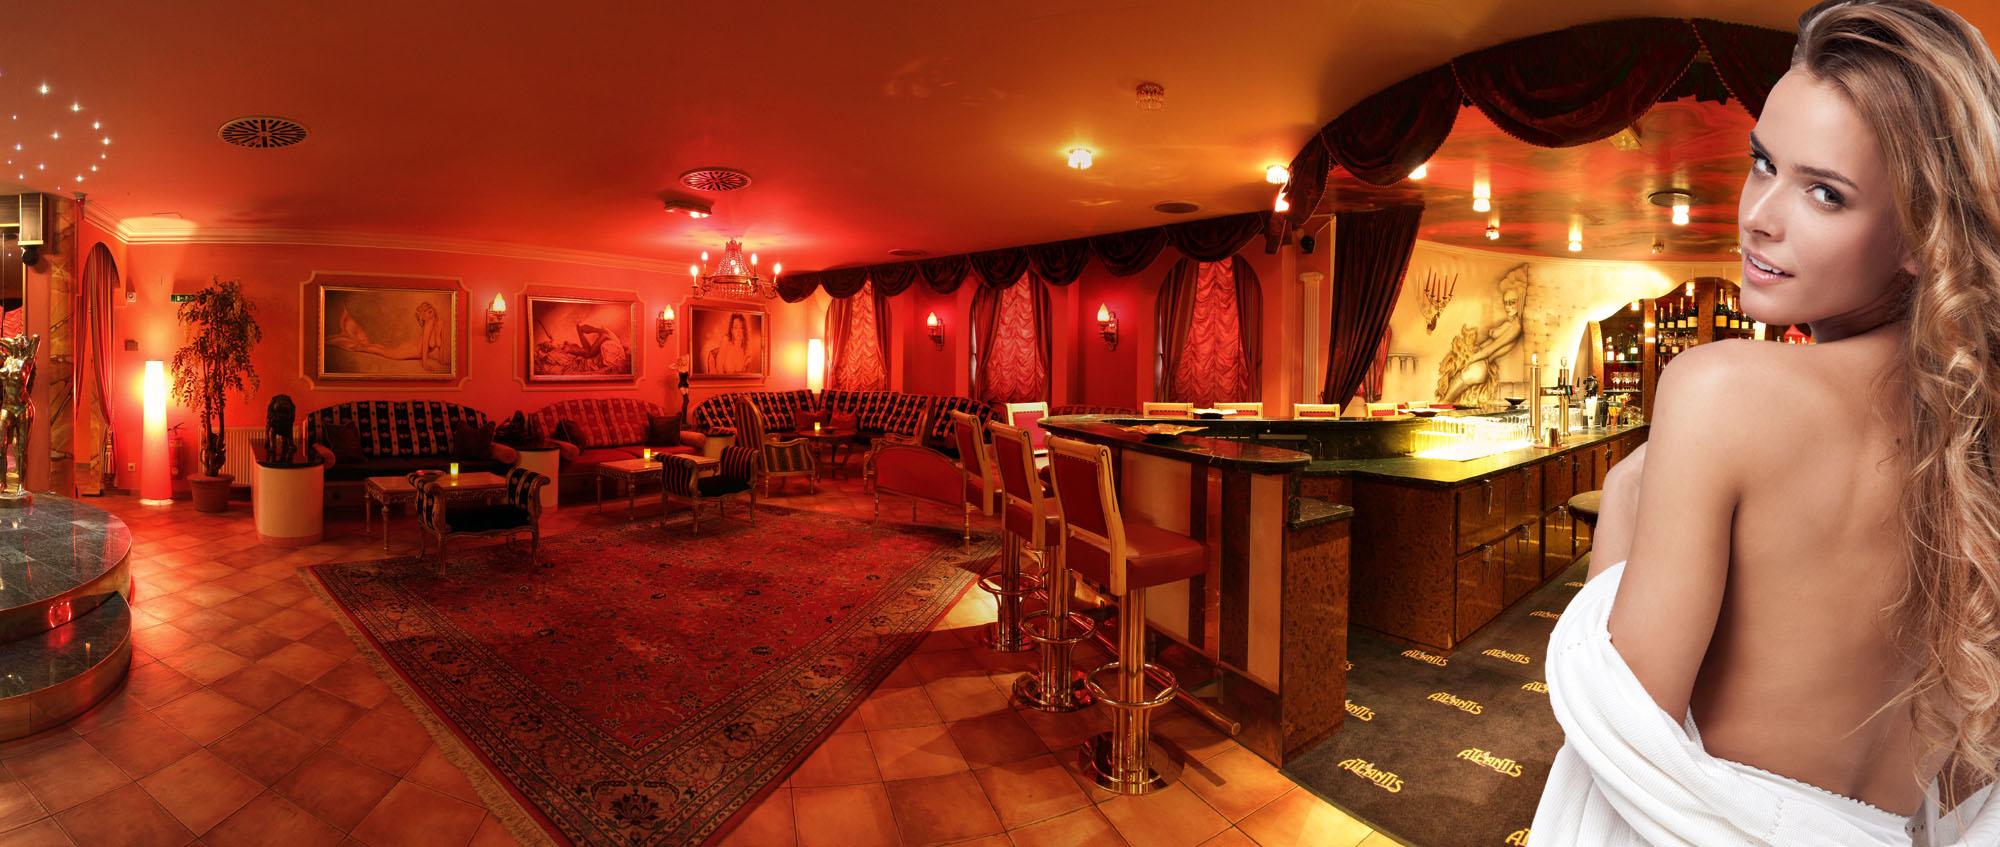 sauna club atlantis ist gleitgel giftig